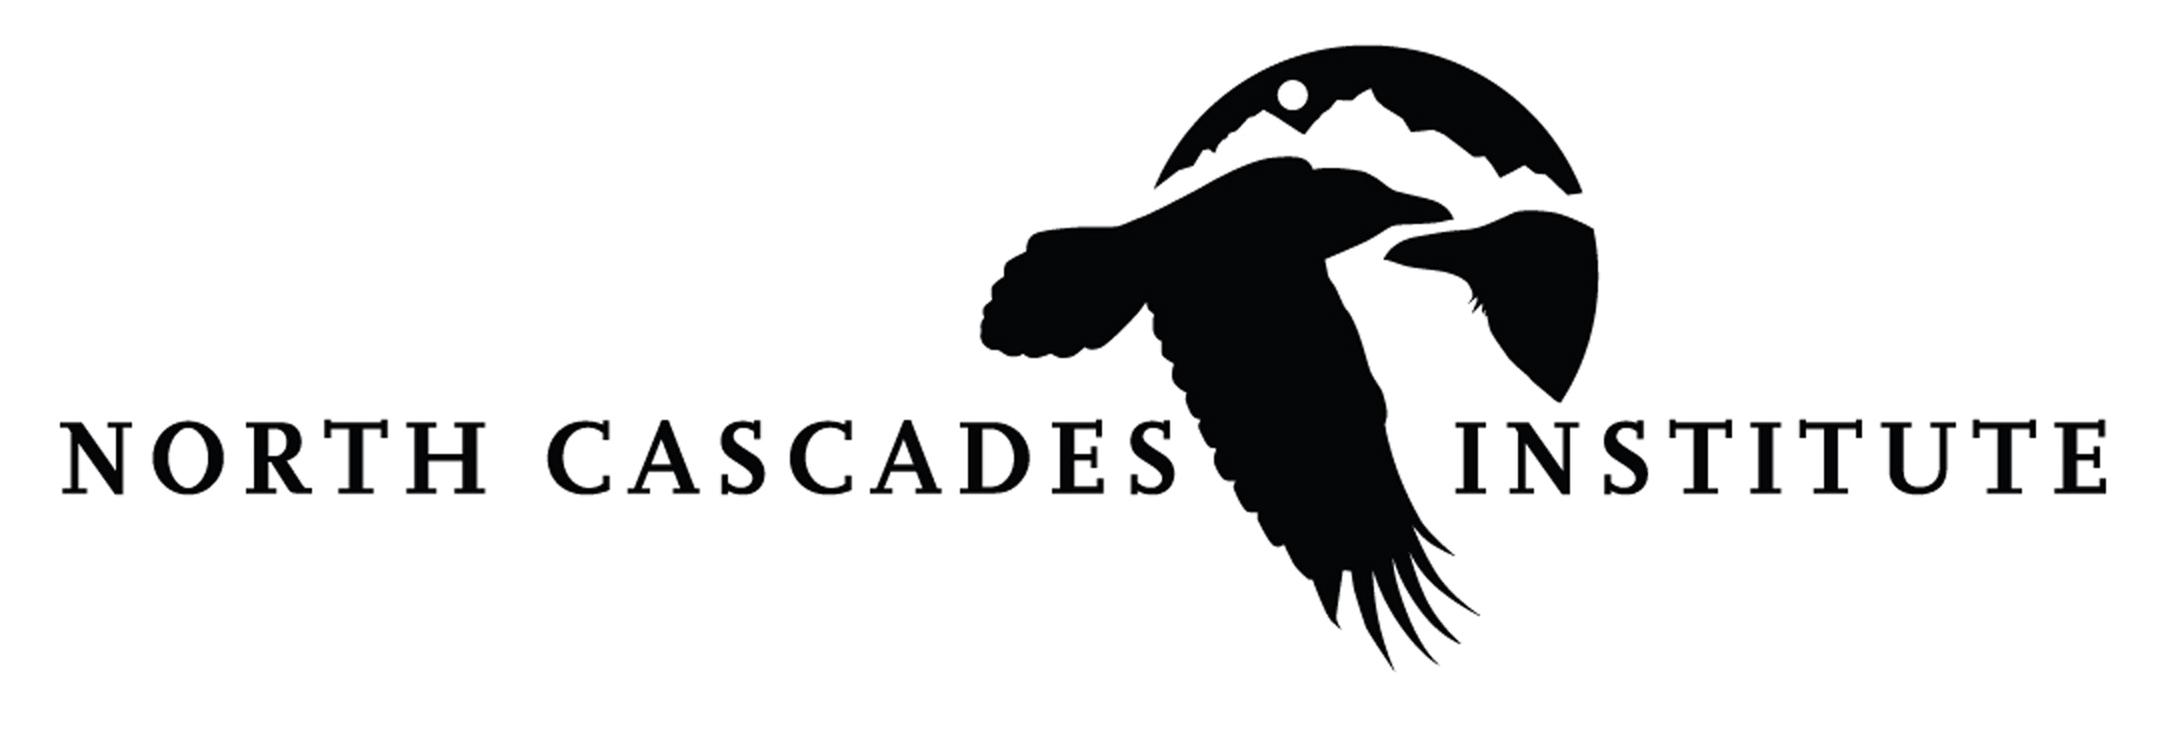 North Cascades Institute